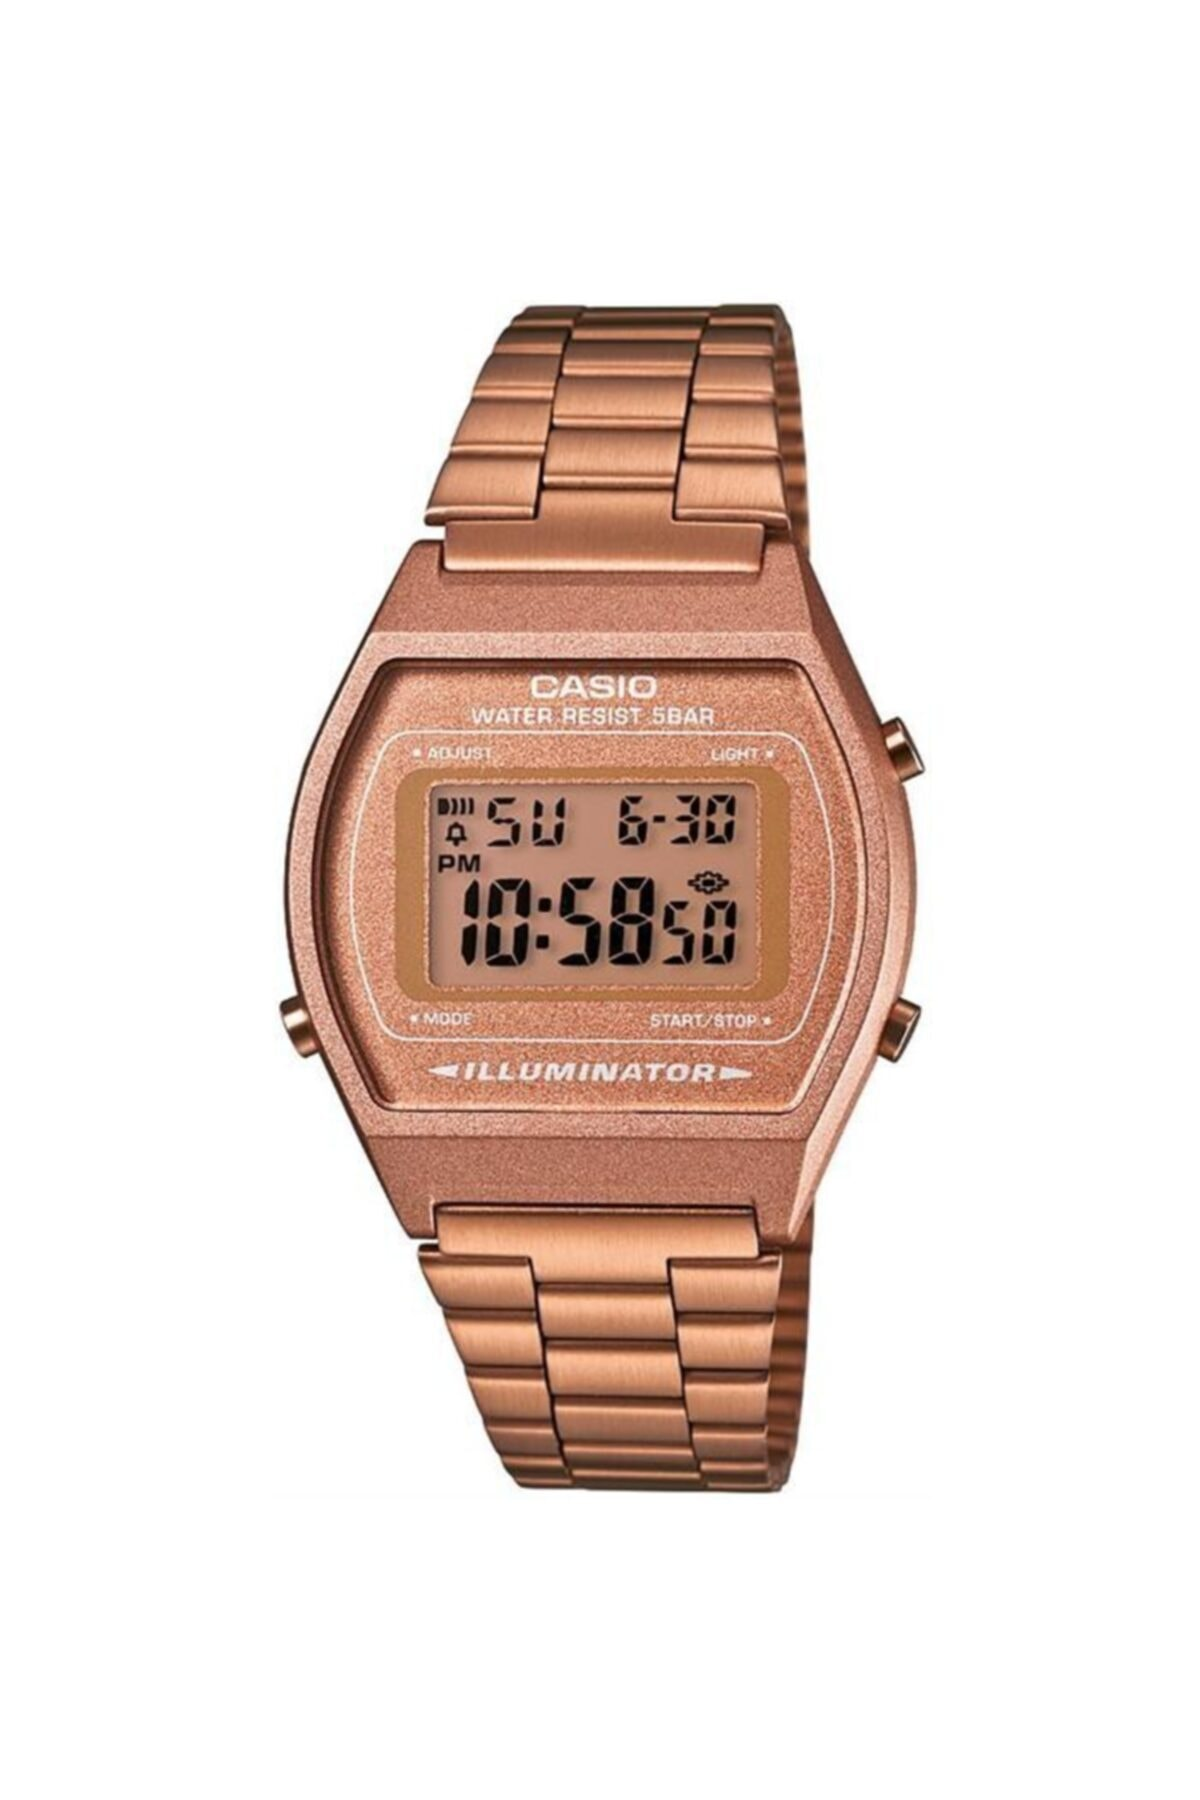 Casio Casıo Retro B640wc-5adf Bayan Kol Saati 1